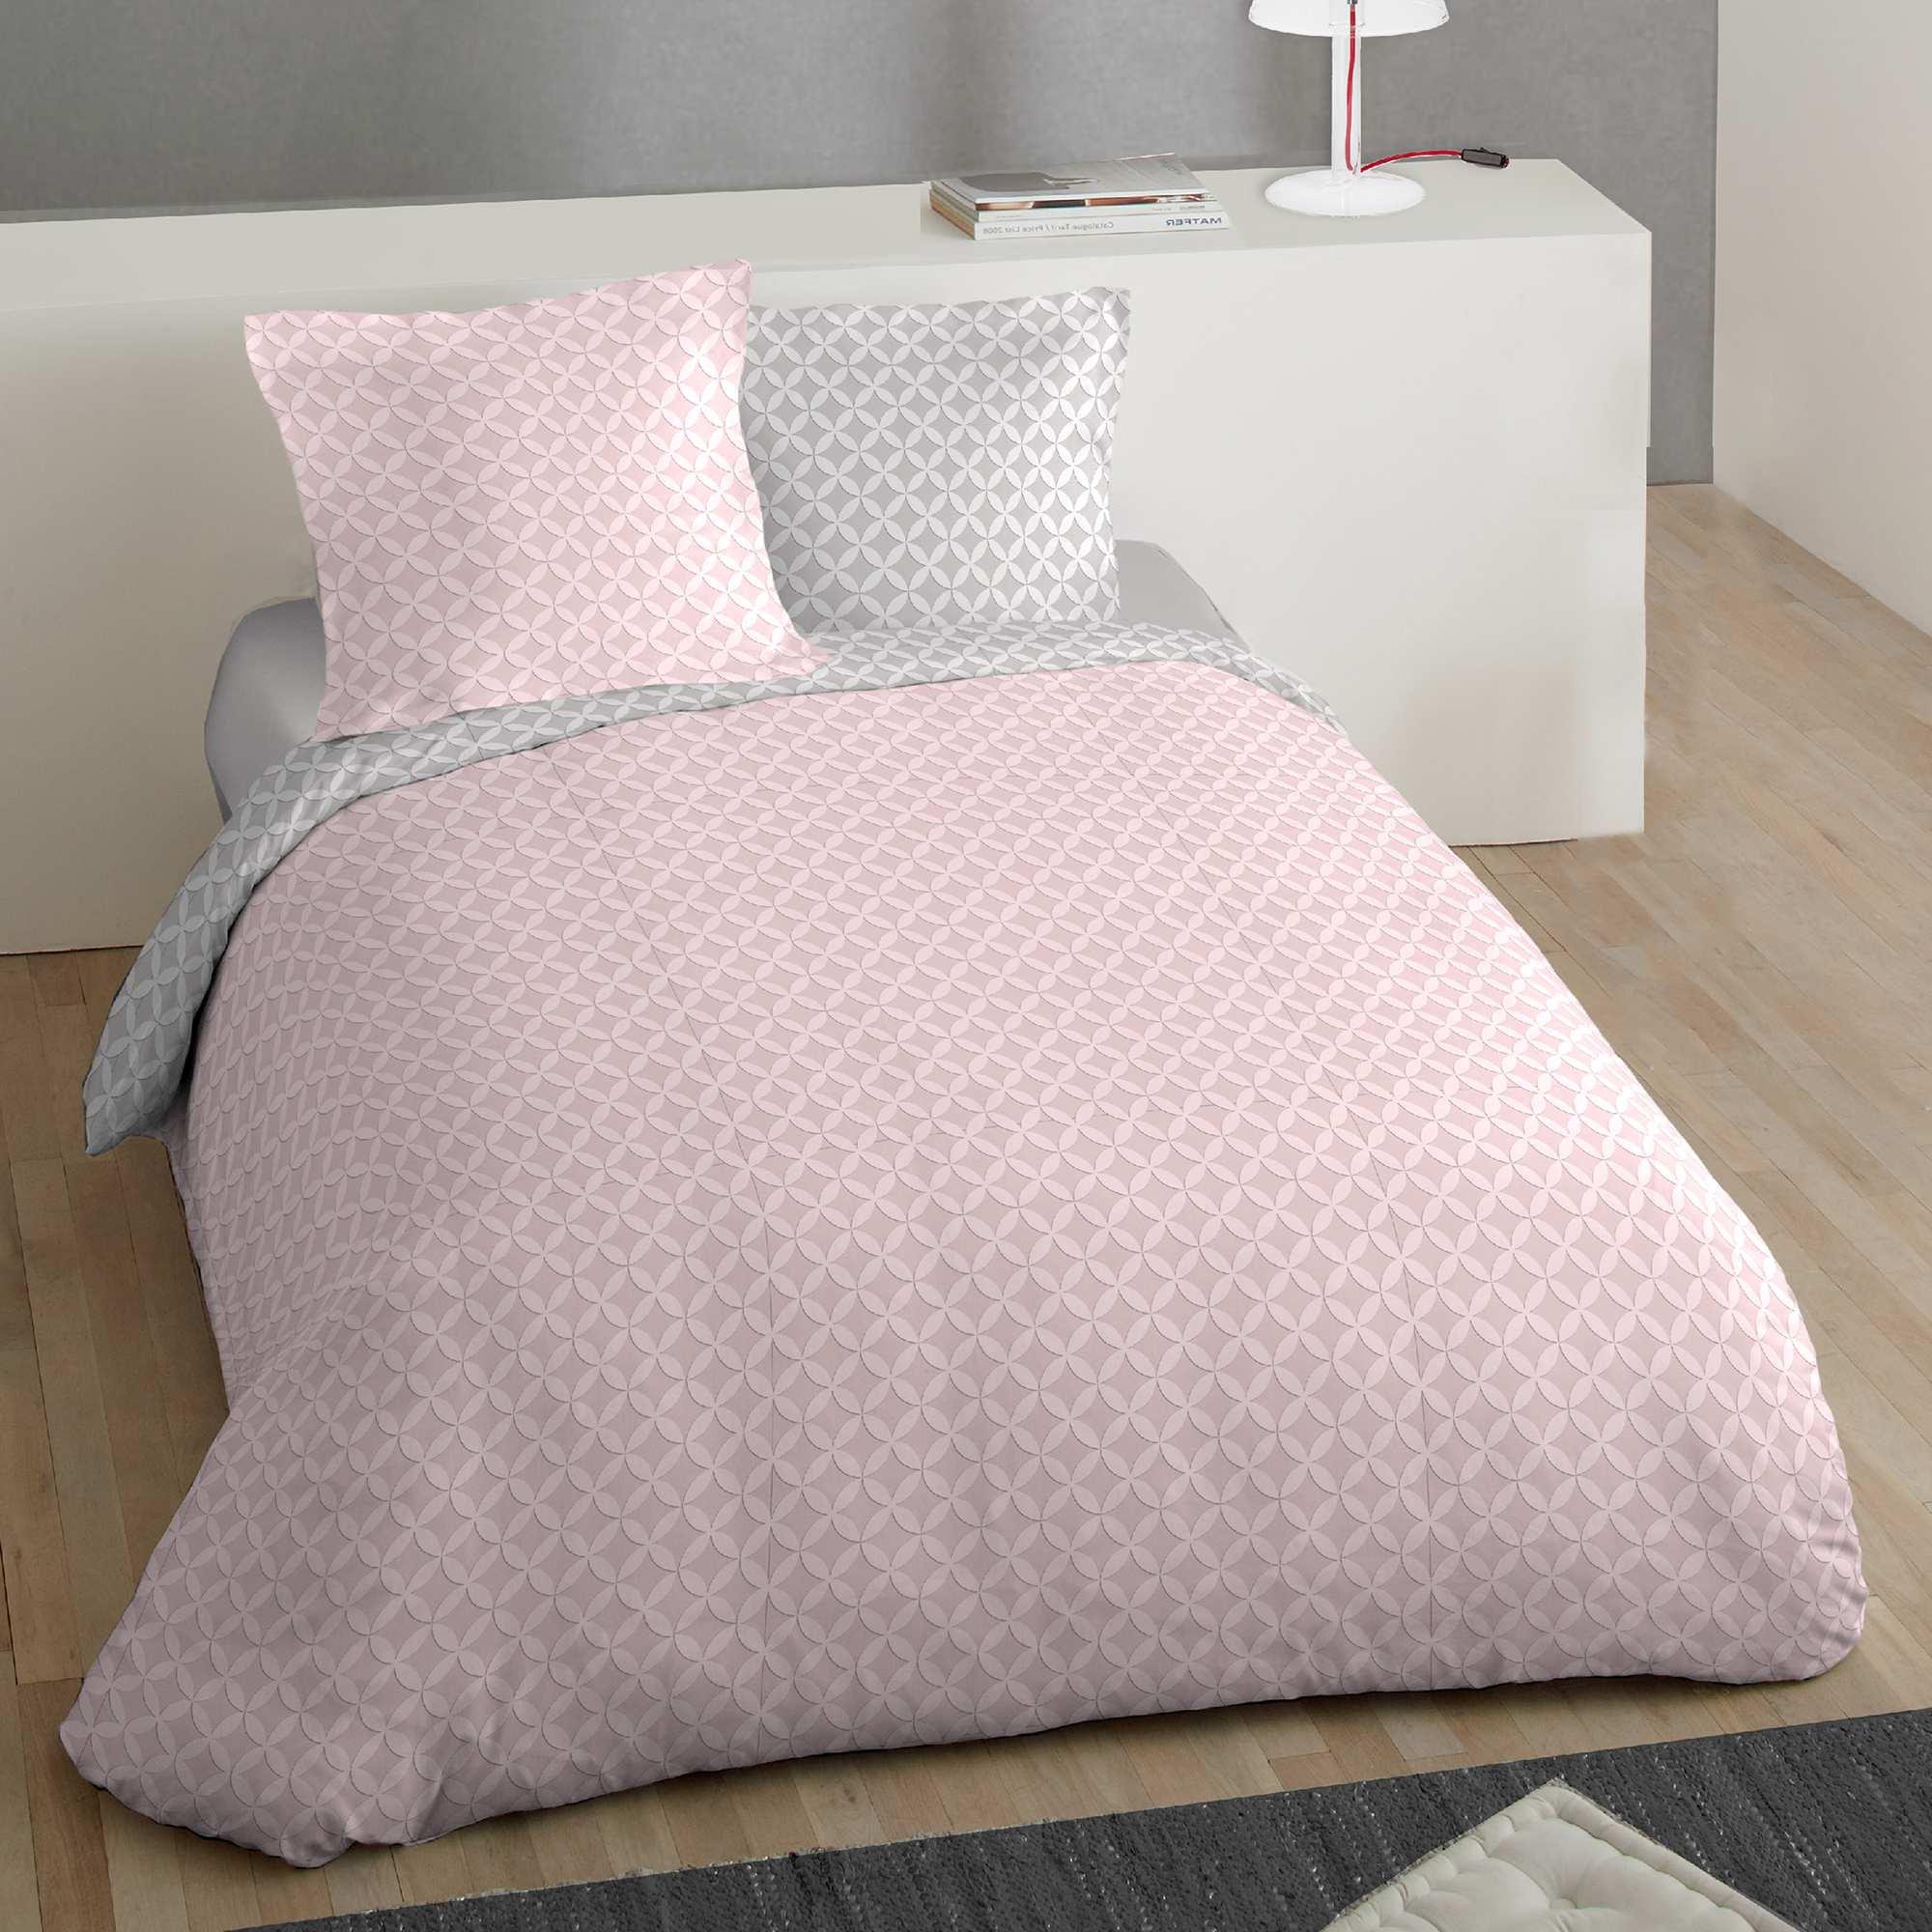 Juego de cama doble estampado 39 roset n 39 hogar rosa - Doble cama para ninos ...